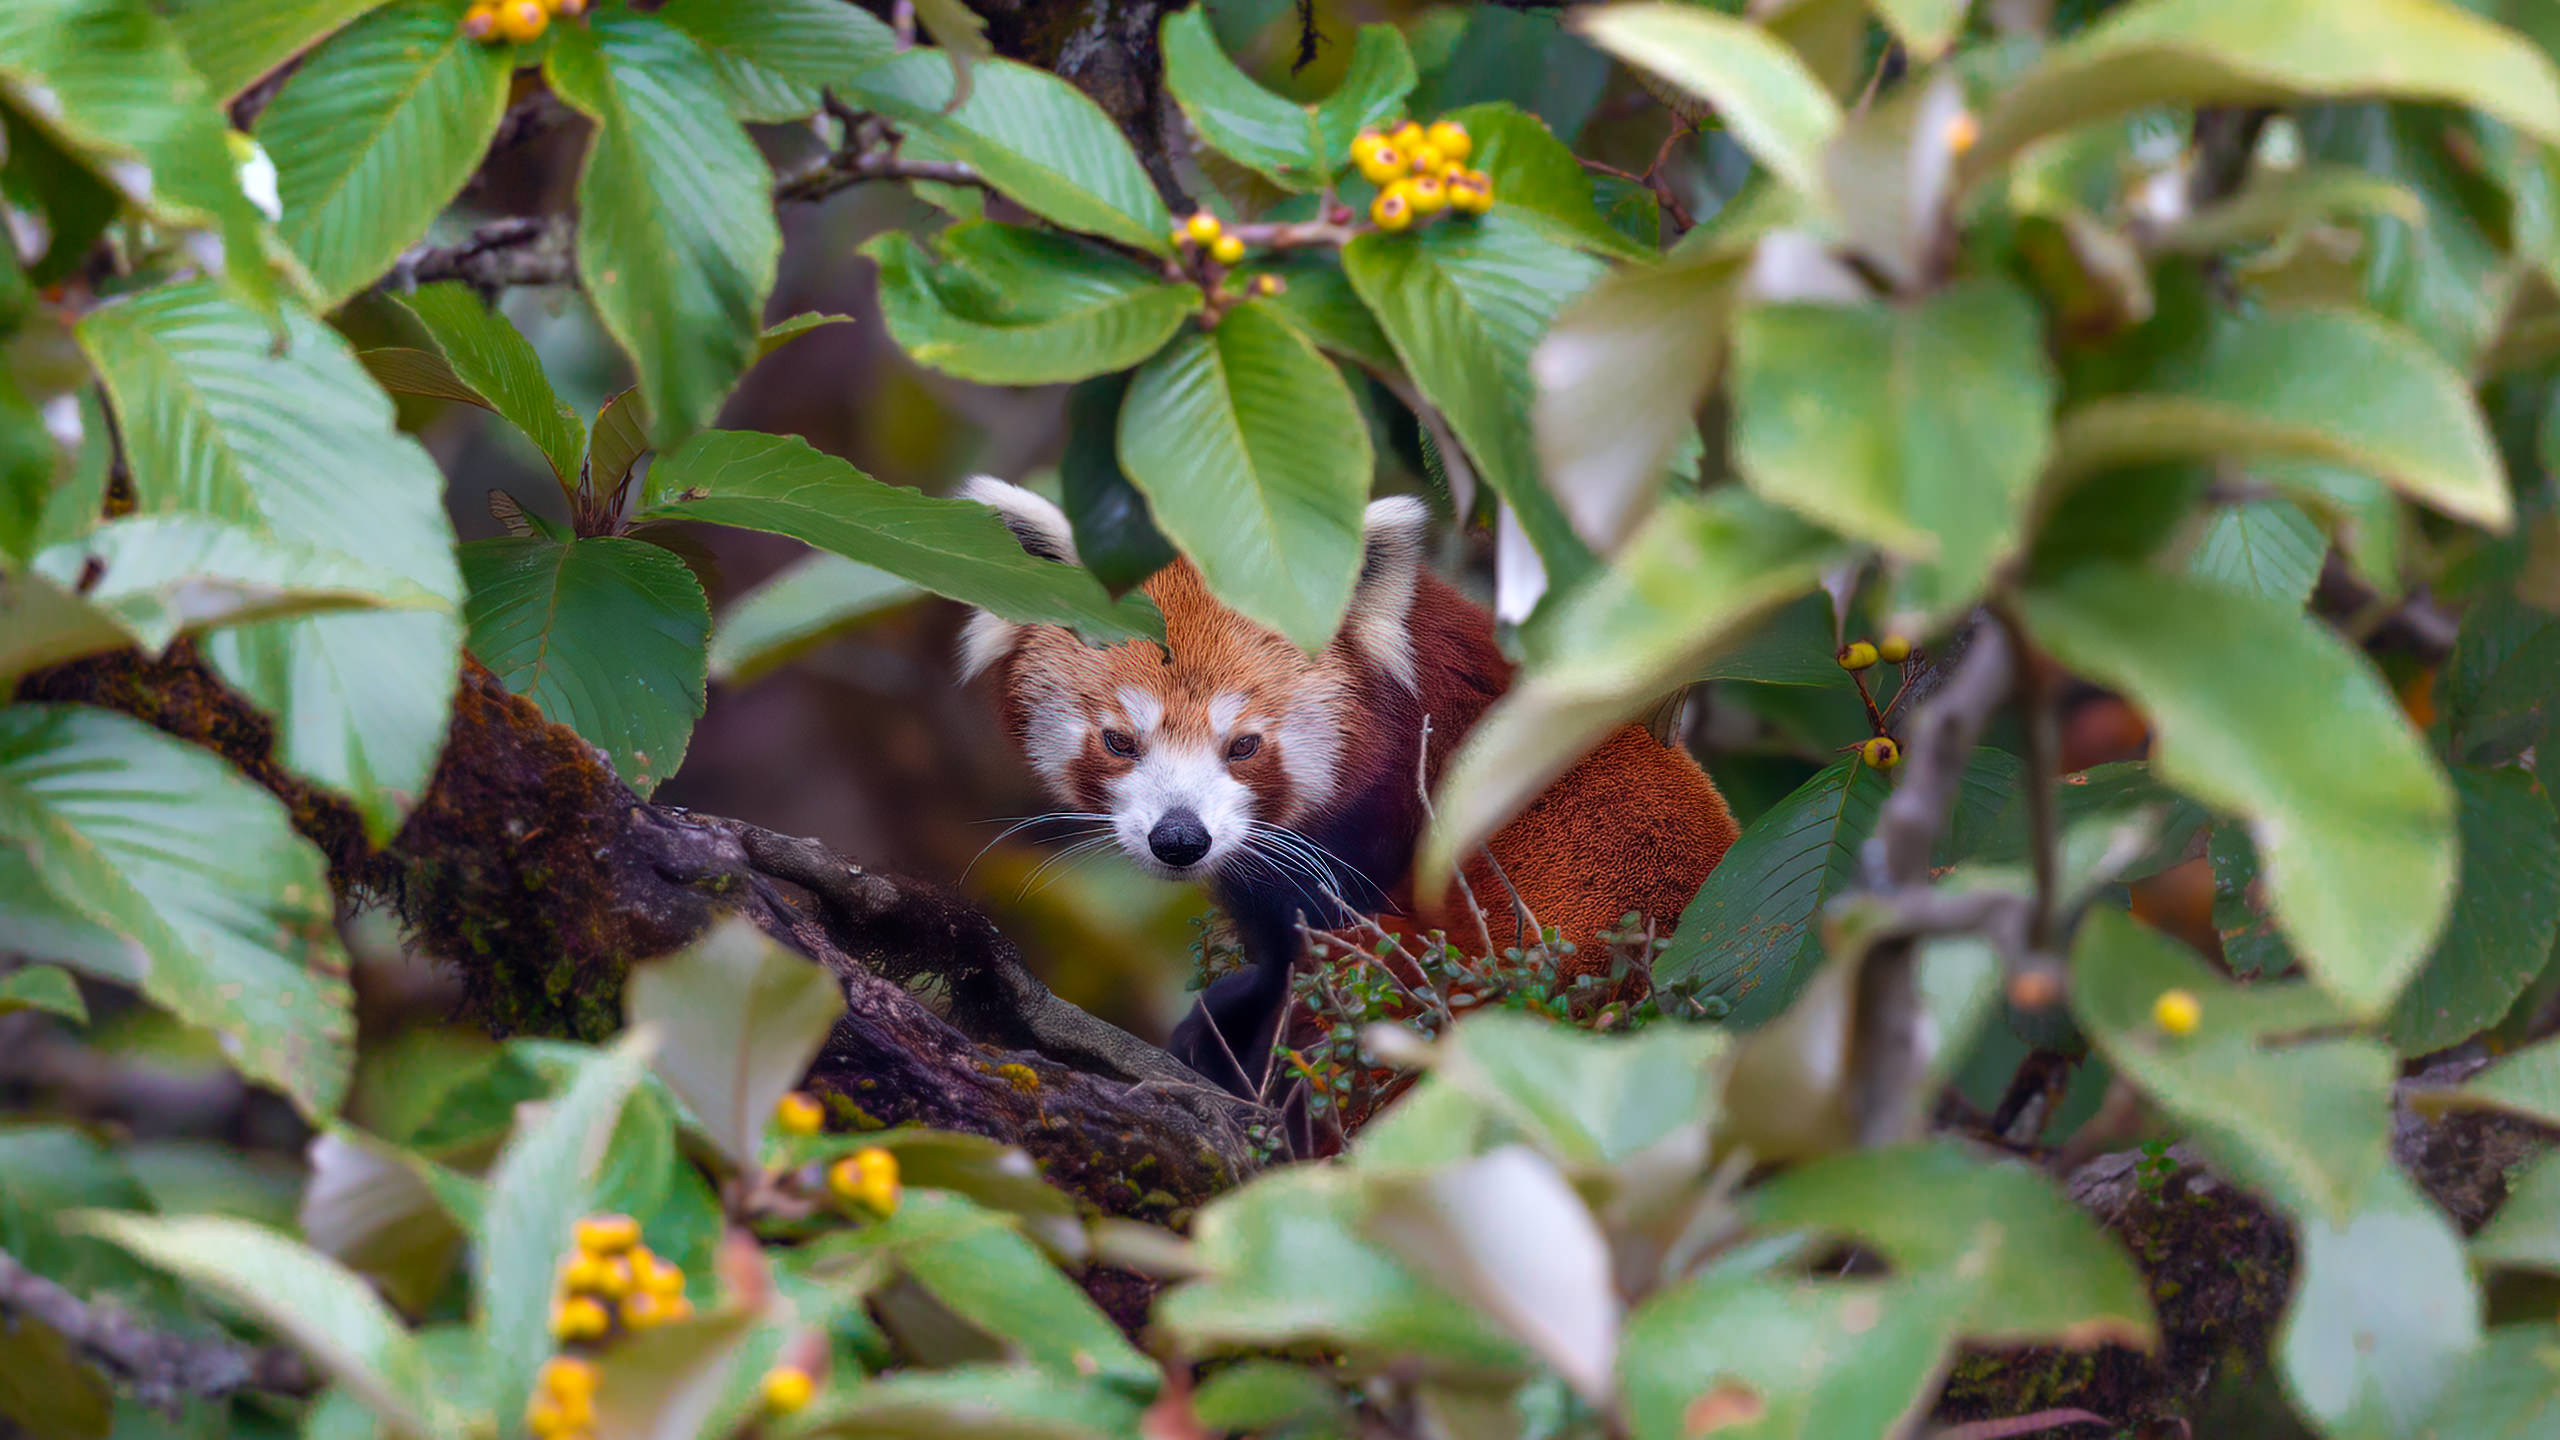 Endangered Red Panda Nepal Himalaya Arindam Bhattacharya